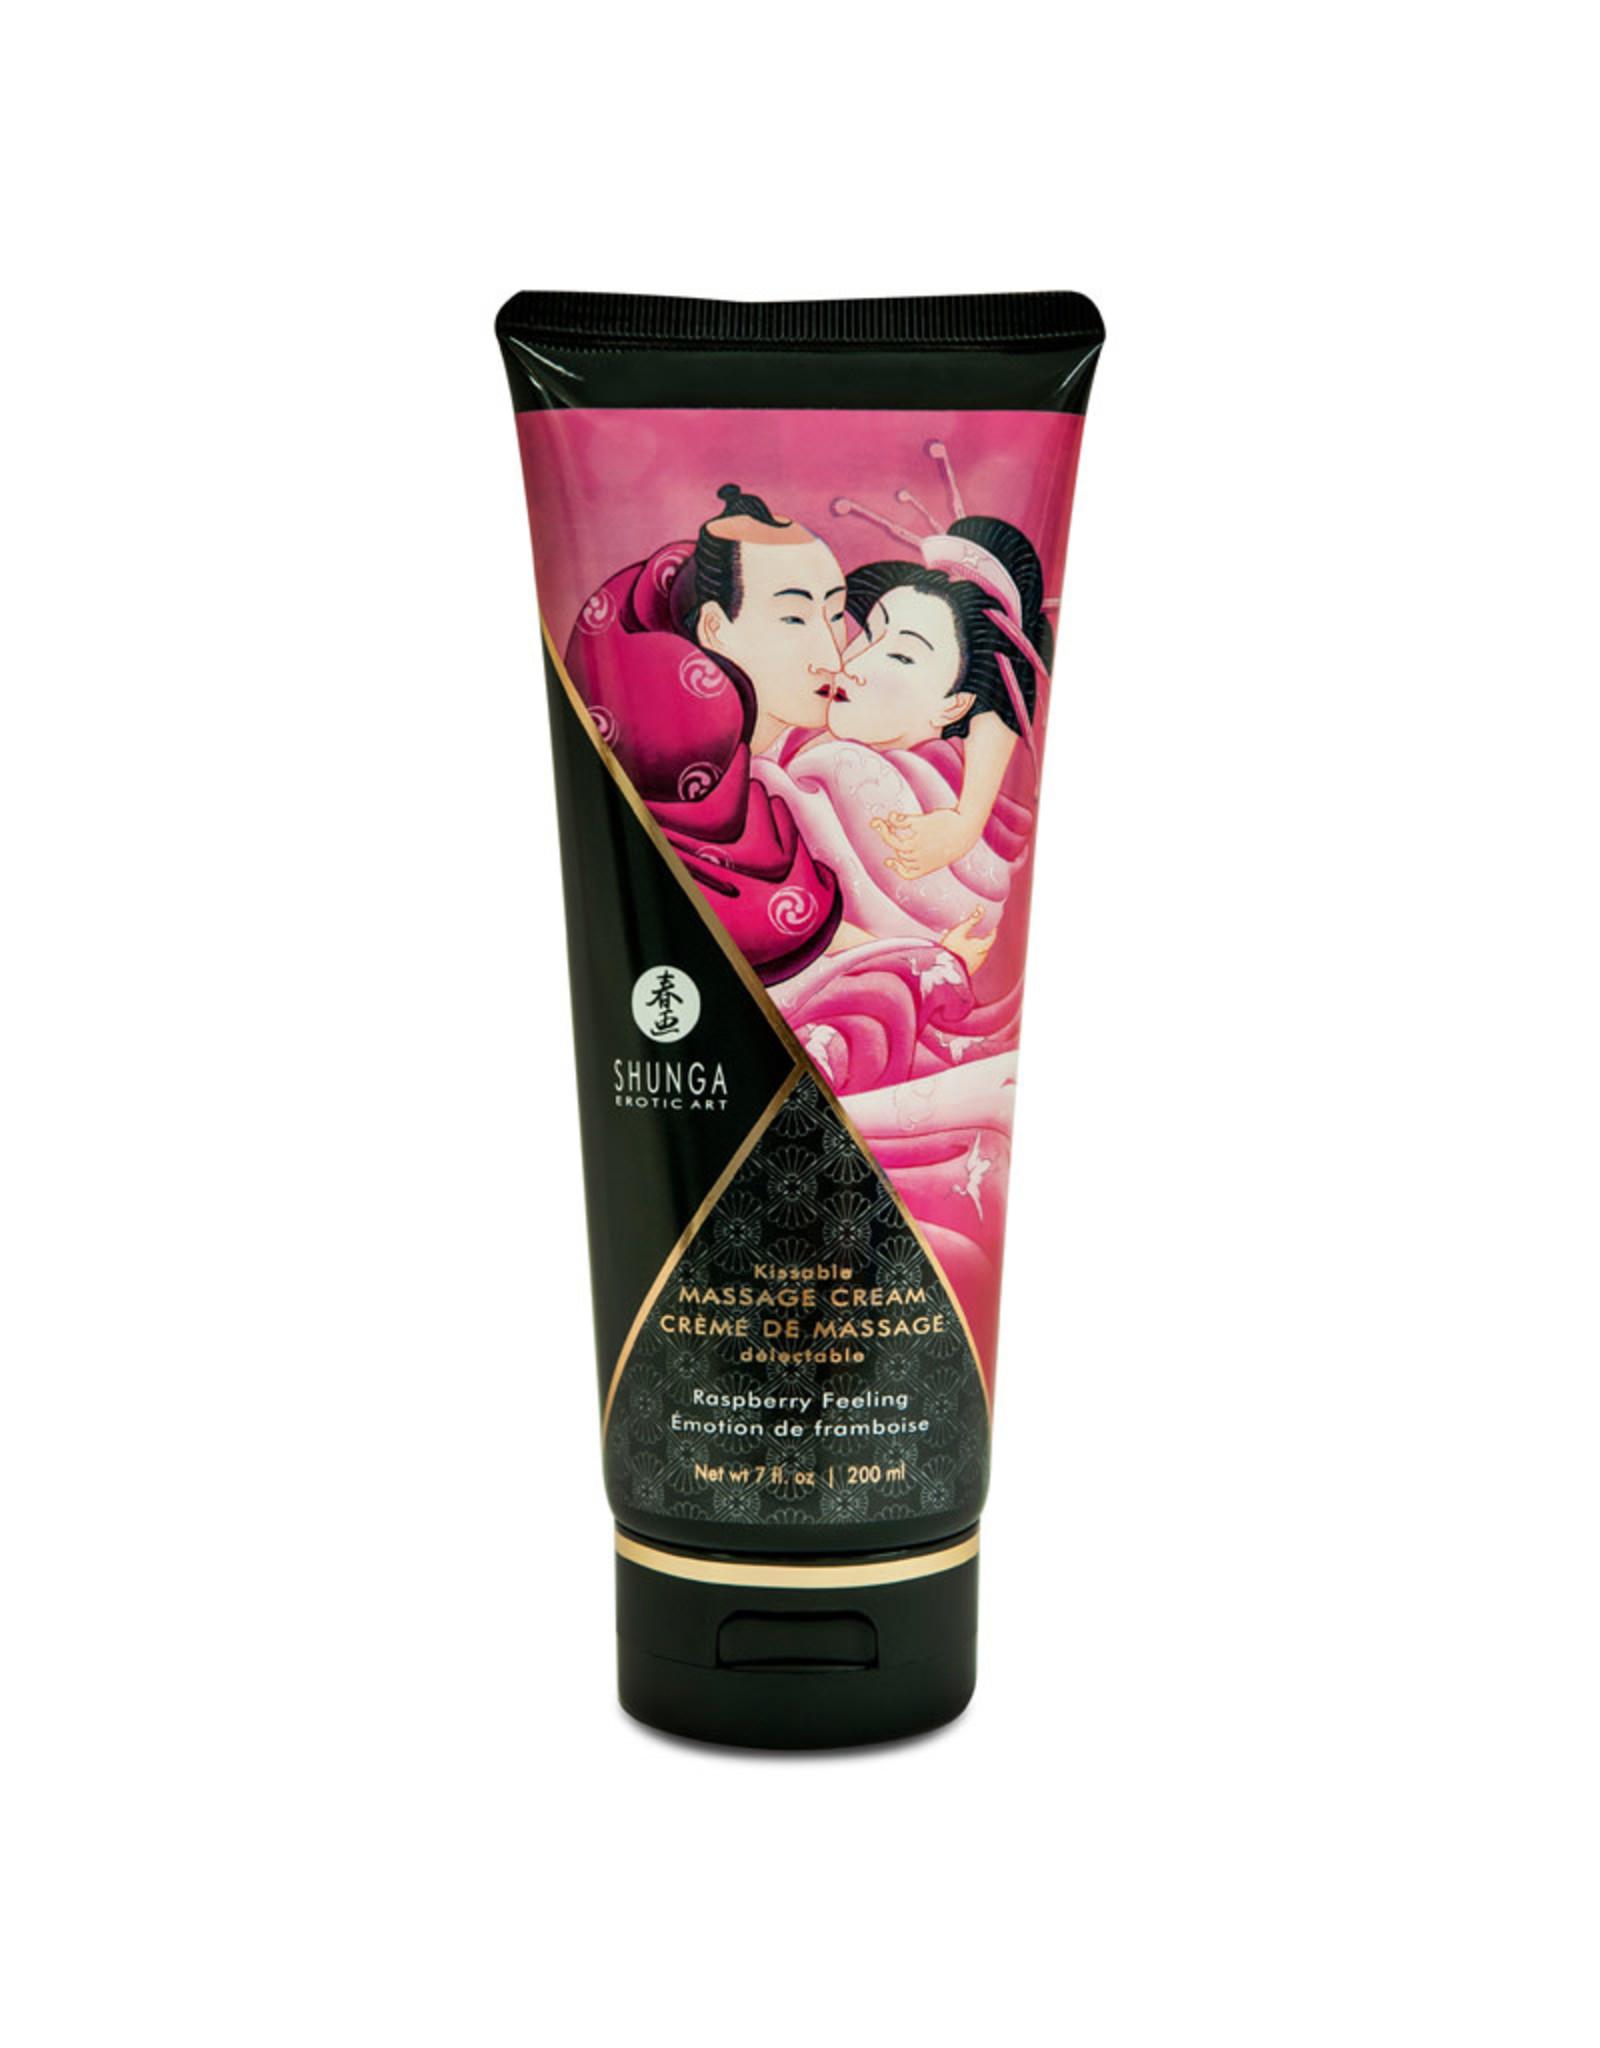 Shunga Shunga - Kissable Massage Cream - Raspberry Feeling